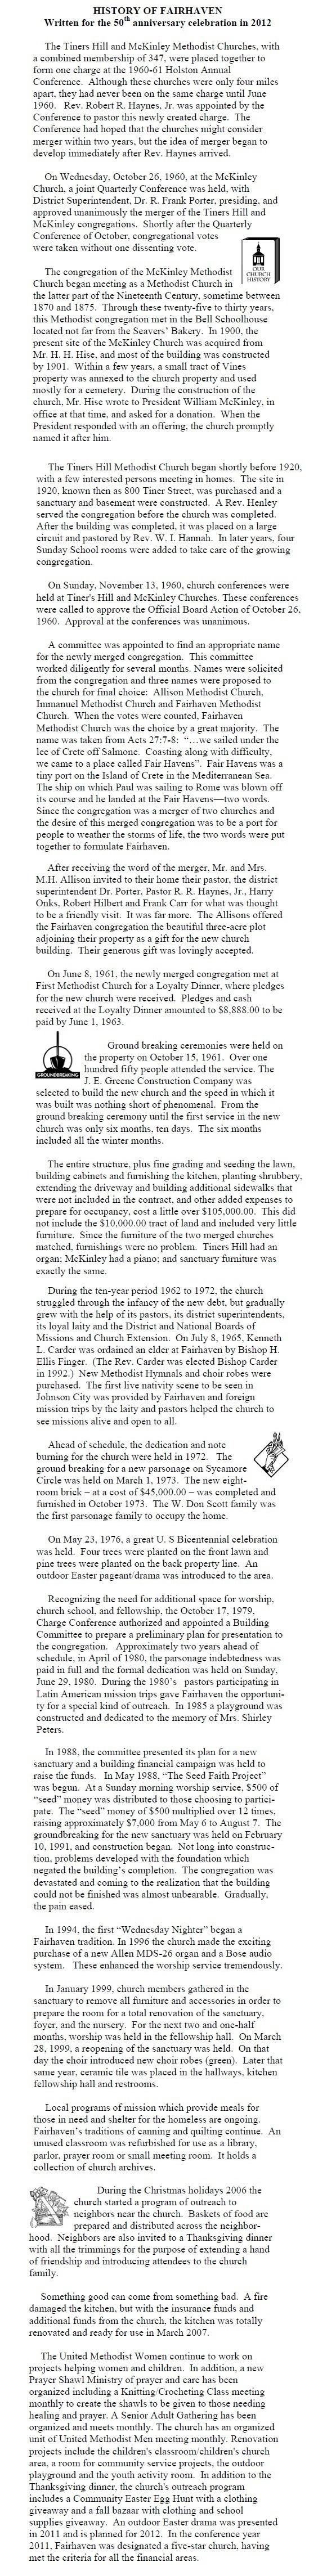 History of Fairhaven